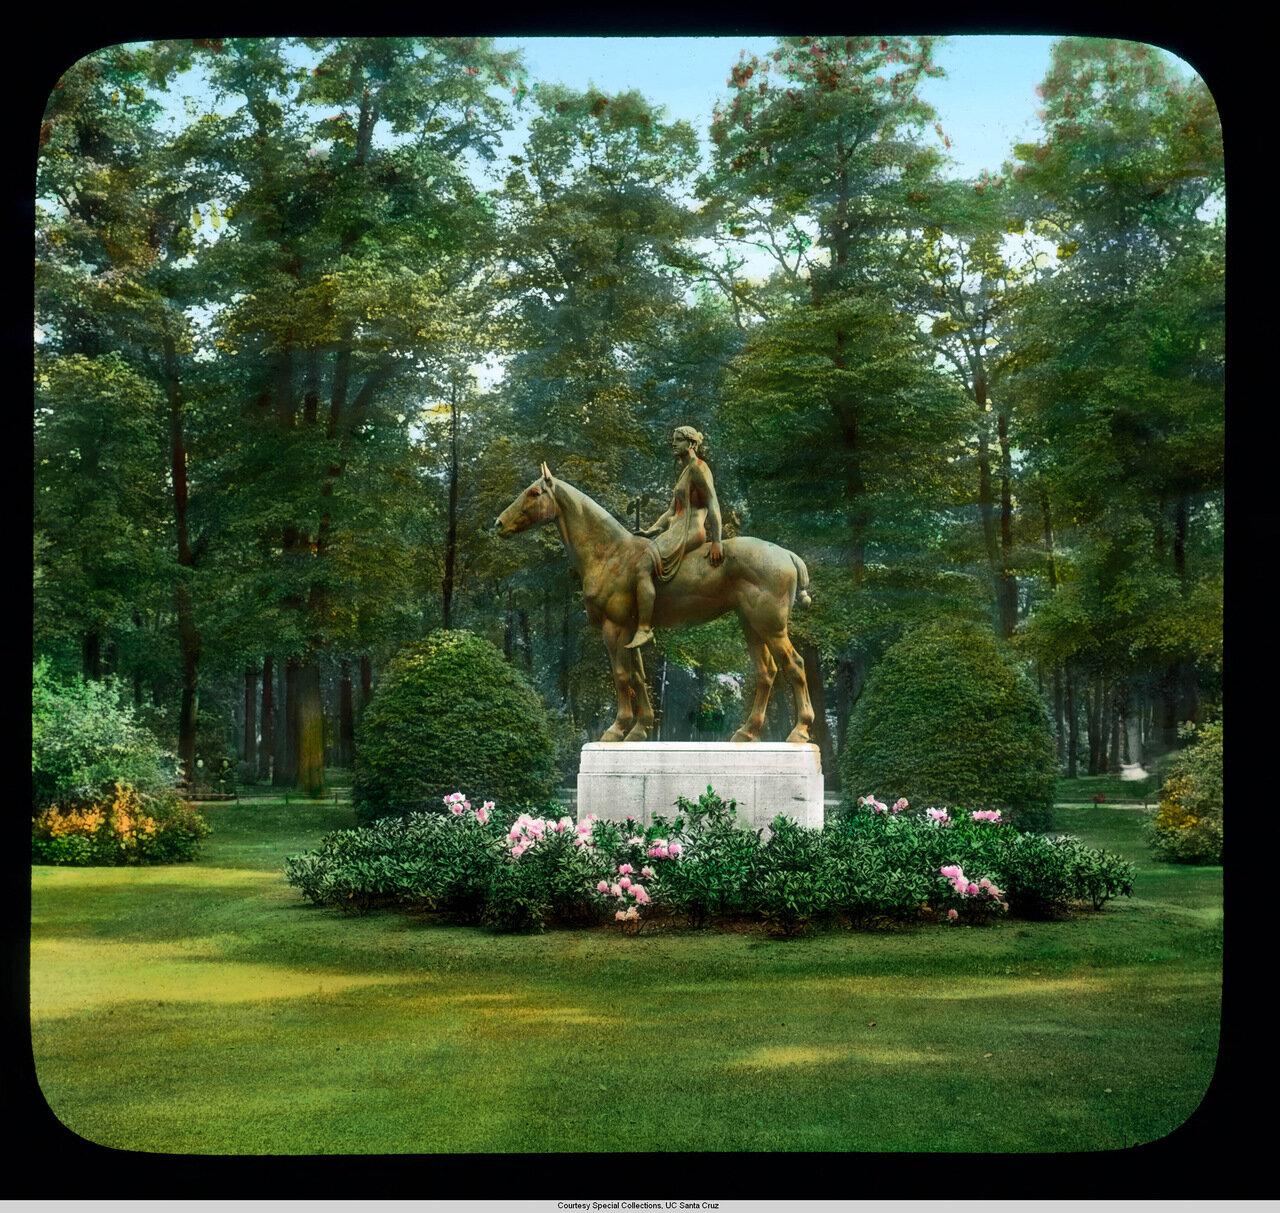 Берлин. Амазонка на лошади скульптора Луи Туальона в Тиргартене